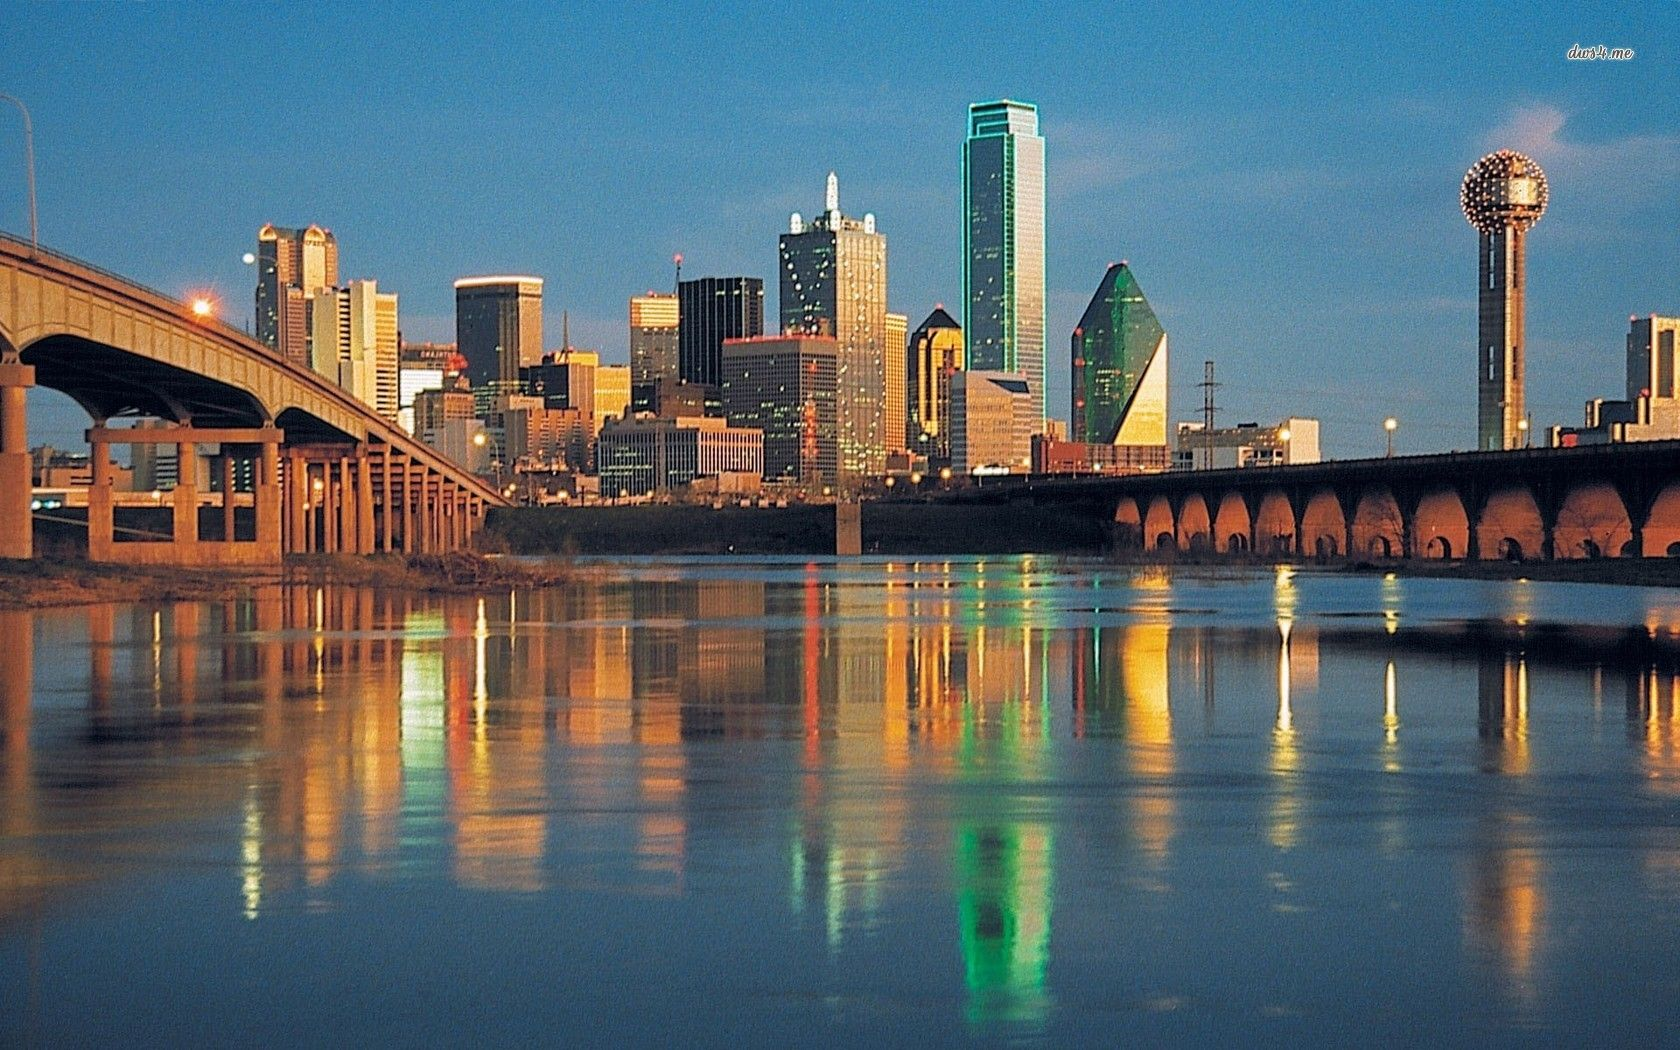 dallas skyline wallpaper  Dallas Skyline Wallpaper | Dallas skyline wallpaper | Health and ...